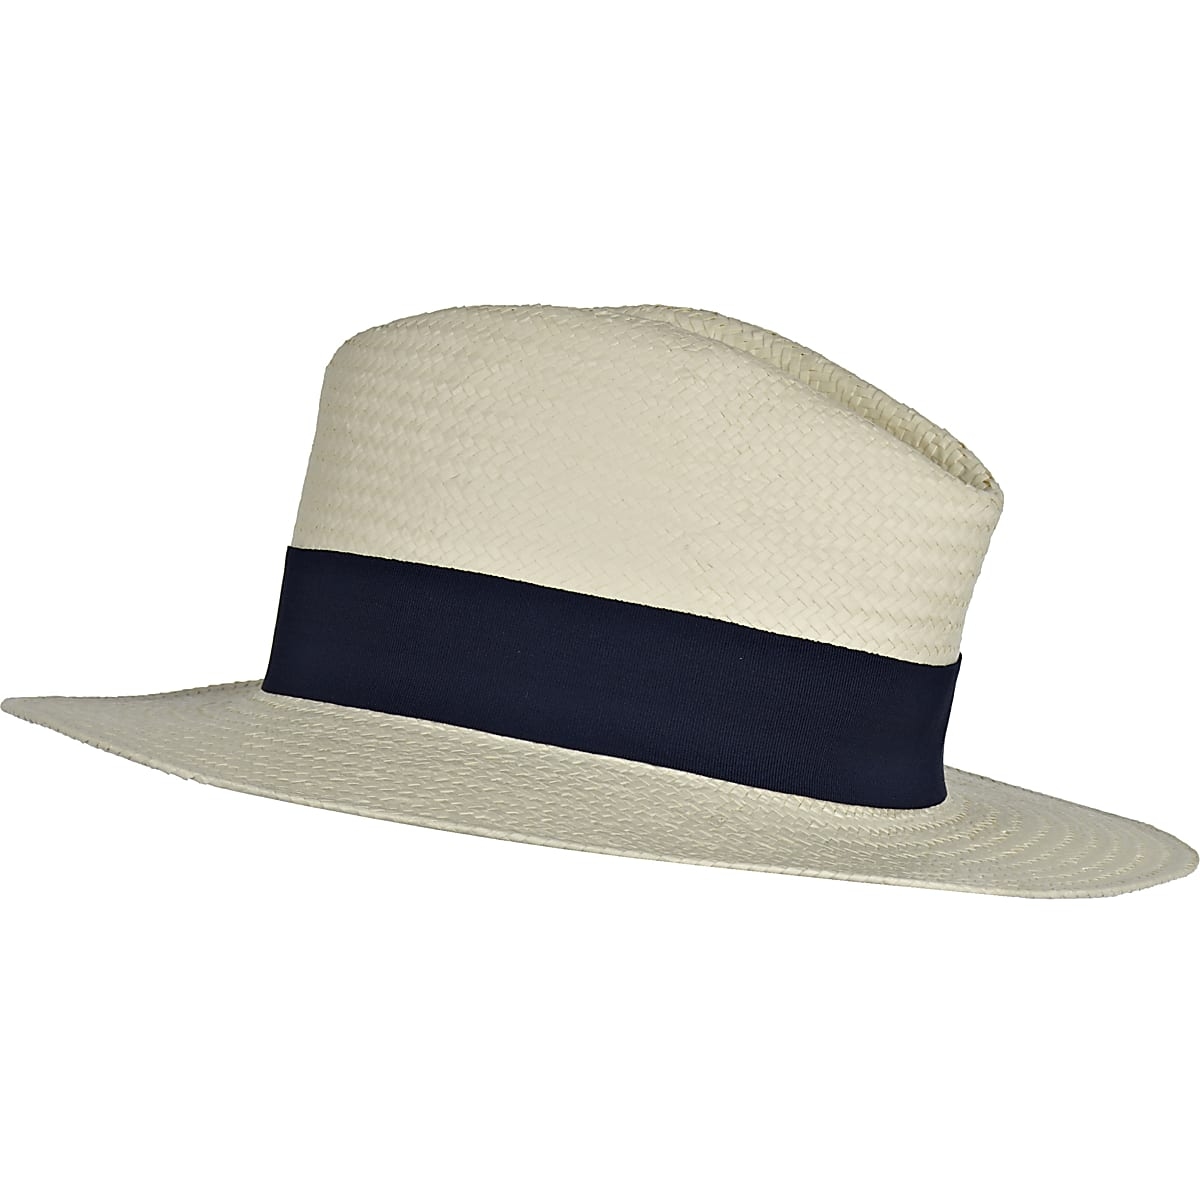 Cream fedora straw hat